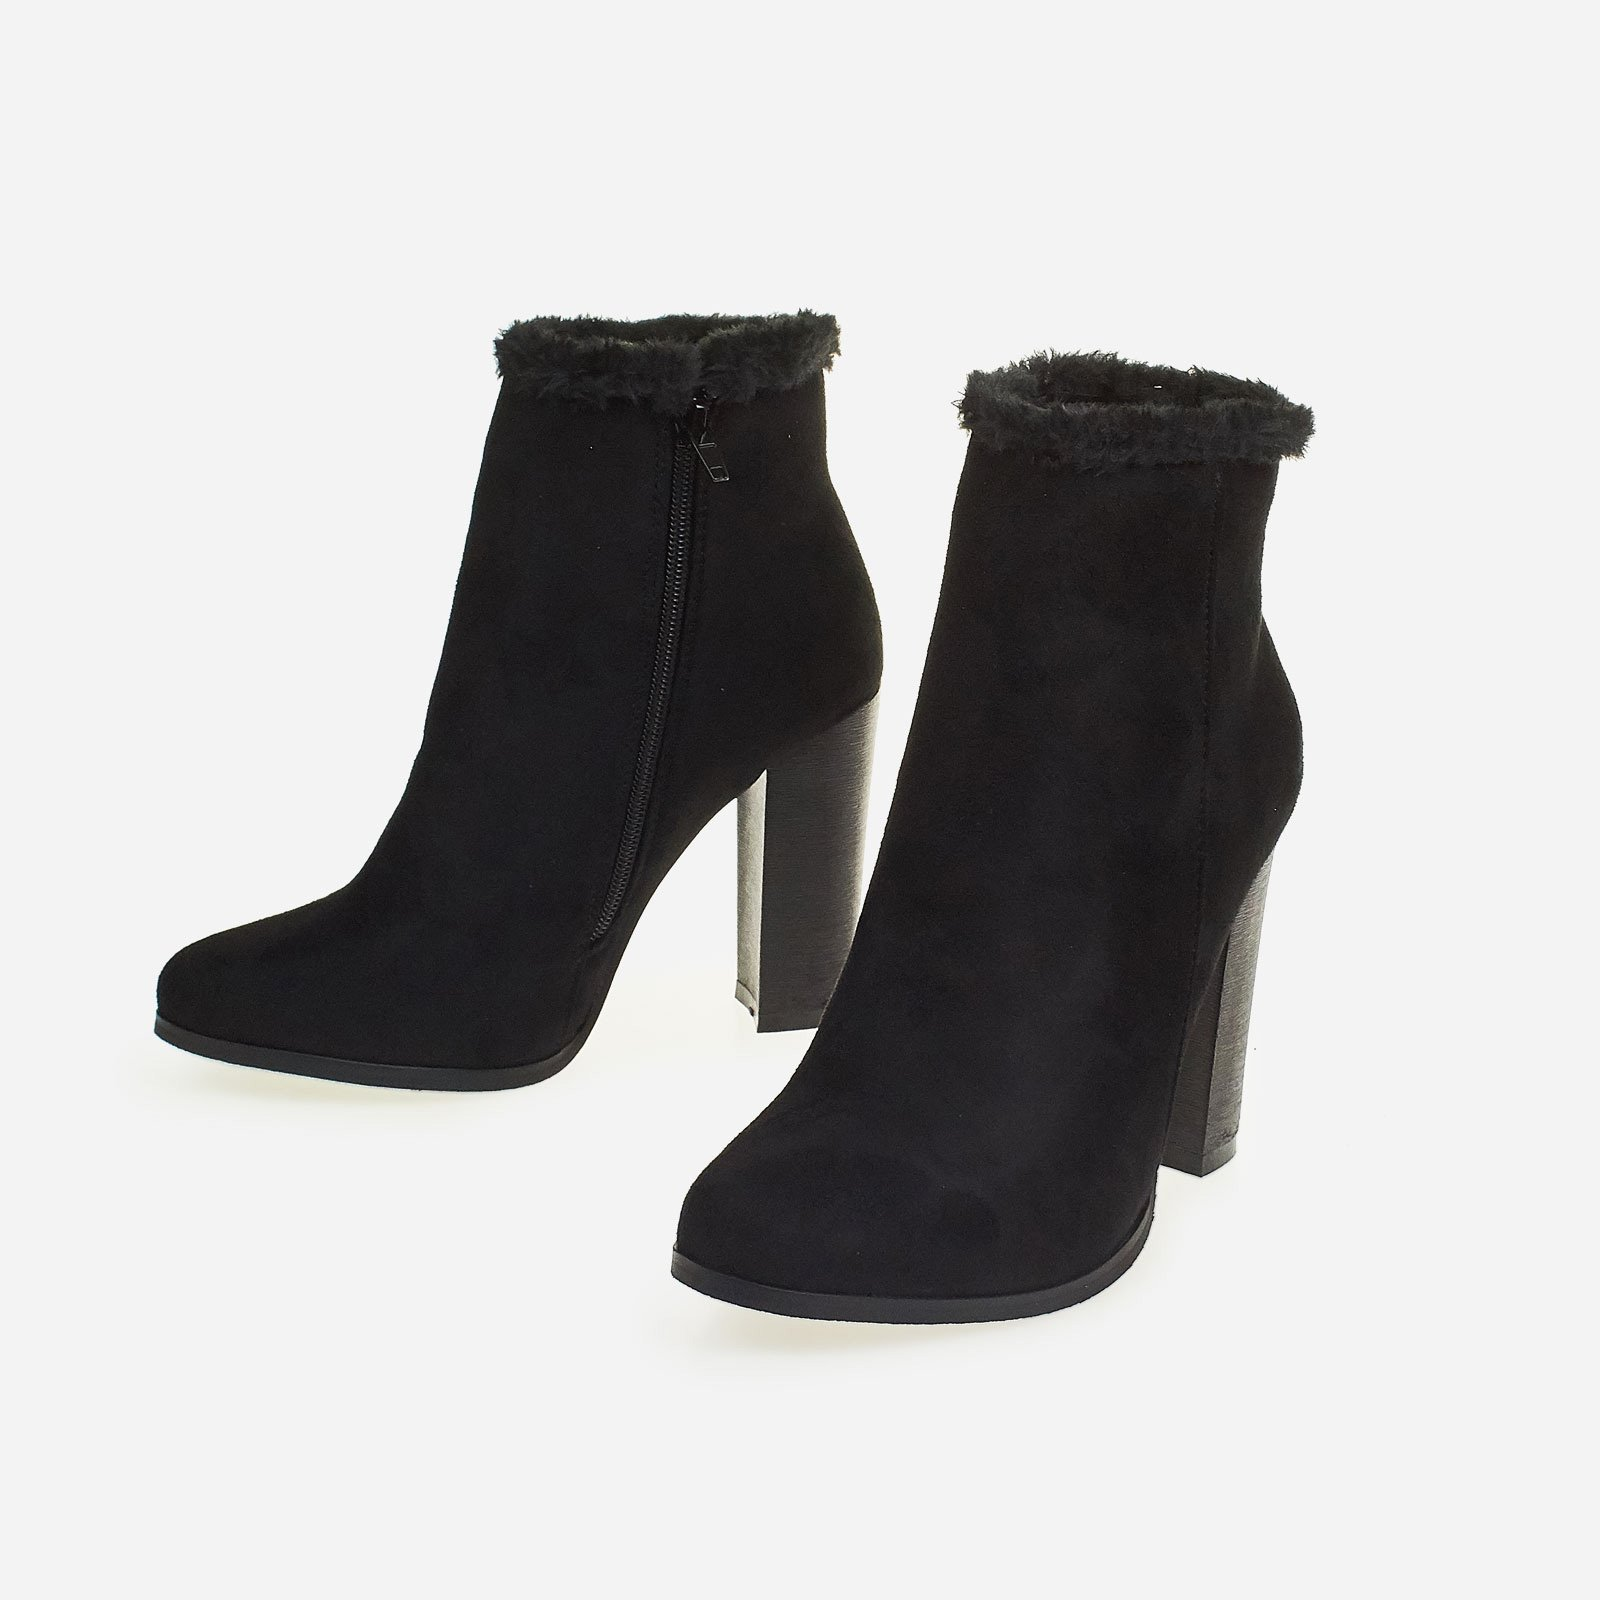 Adison Faux Fur Trim Block Heel Ankle Boot In Black Faux Suede